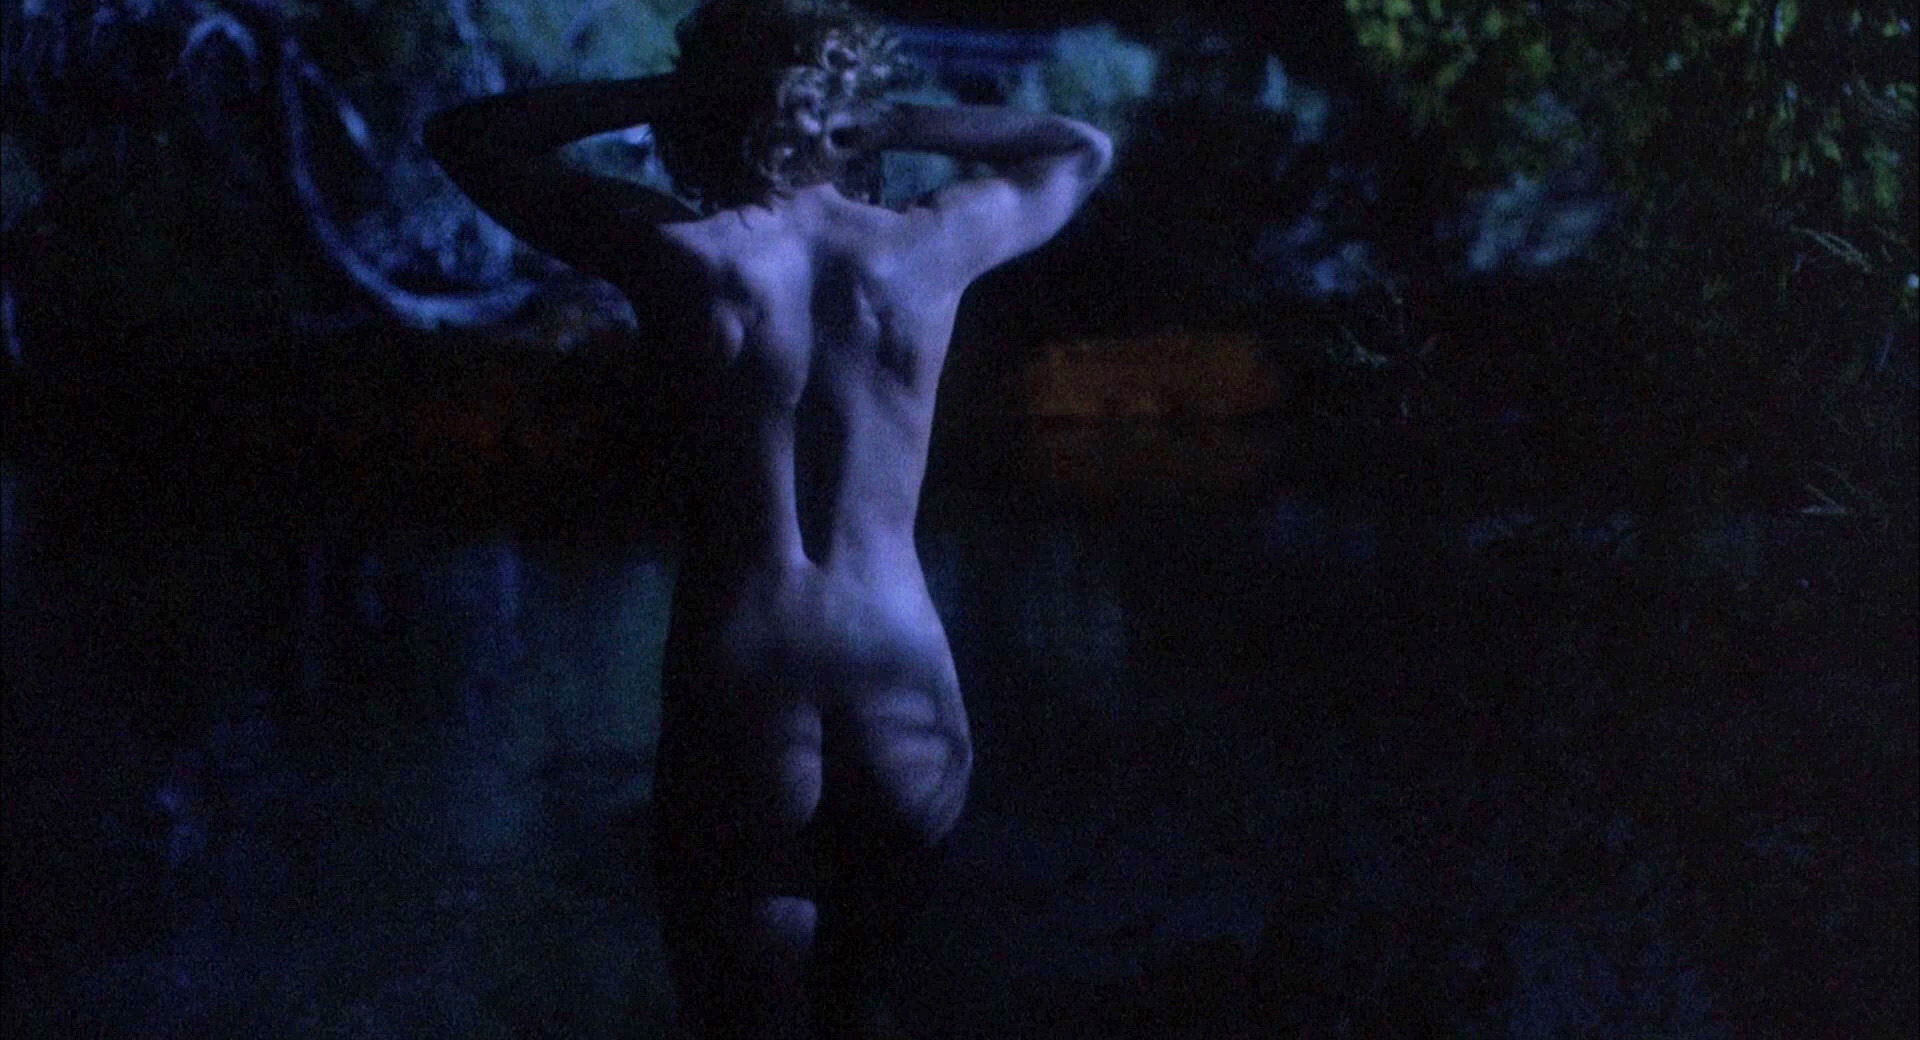 virginia Jennifer madsen nude connelly